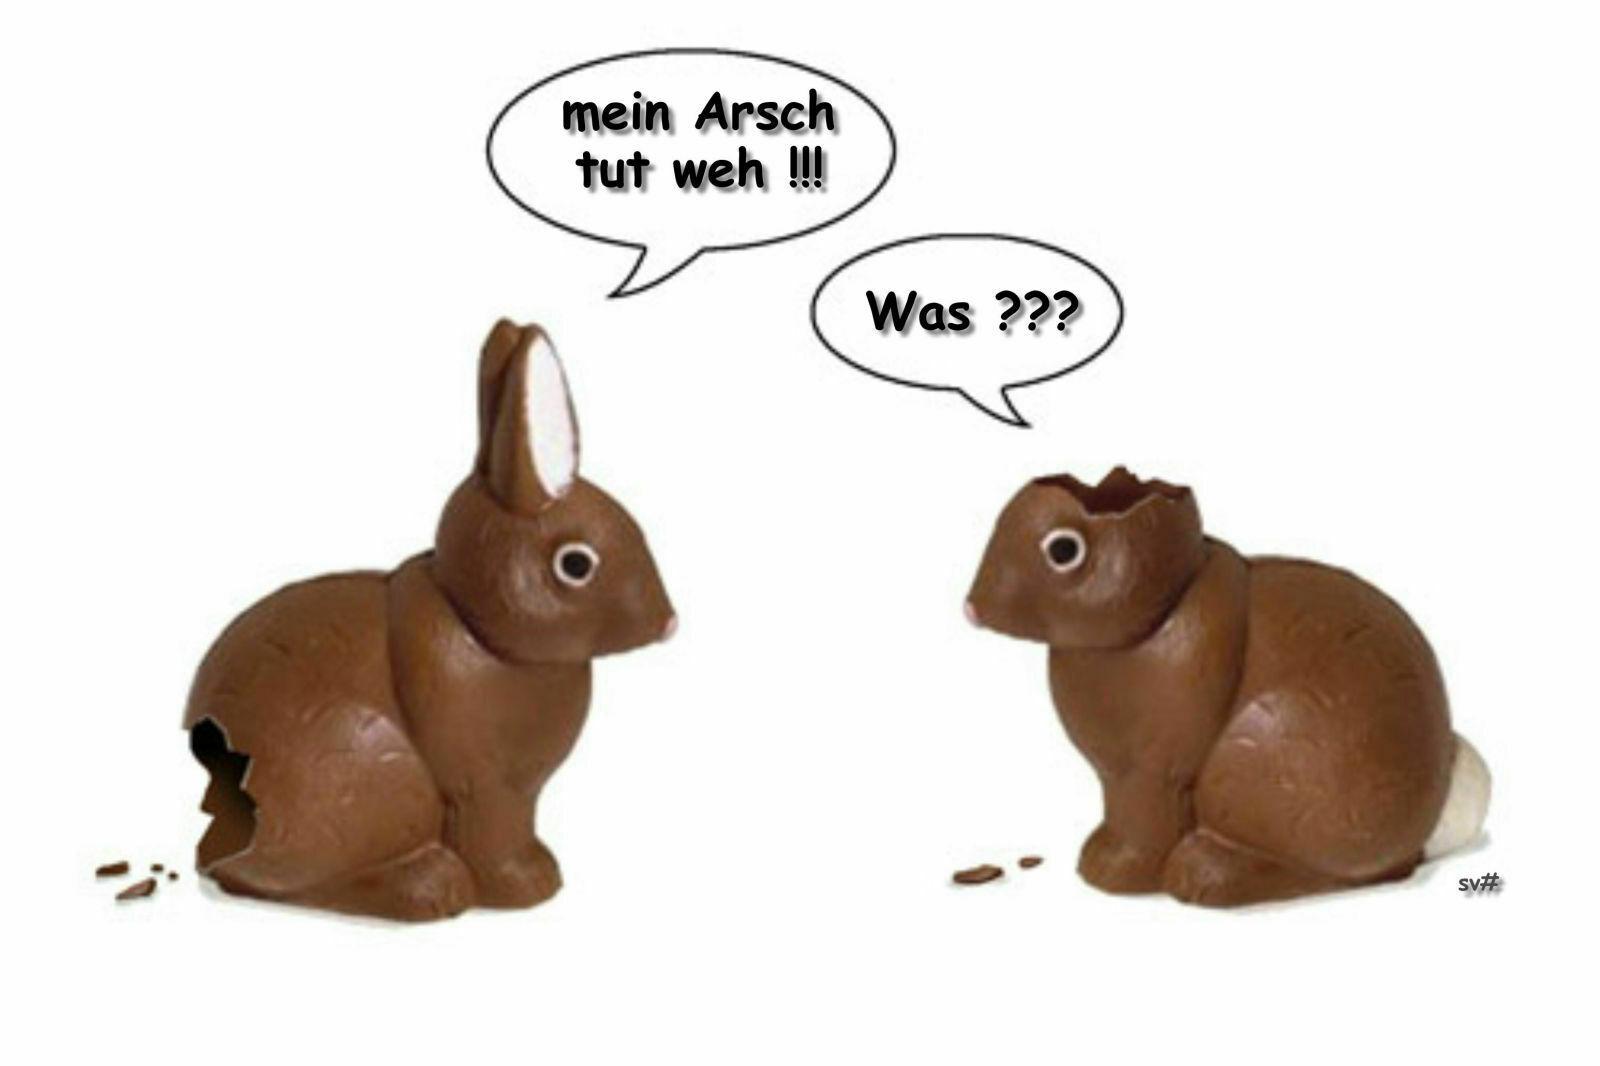 Lustiges-Zu-Ostern-Fun-Zone-Bestimmt-Fur-Ostern-Lustig bei Lustiges Zu Ostern